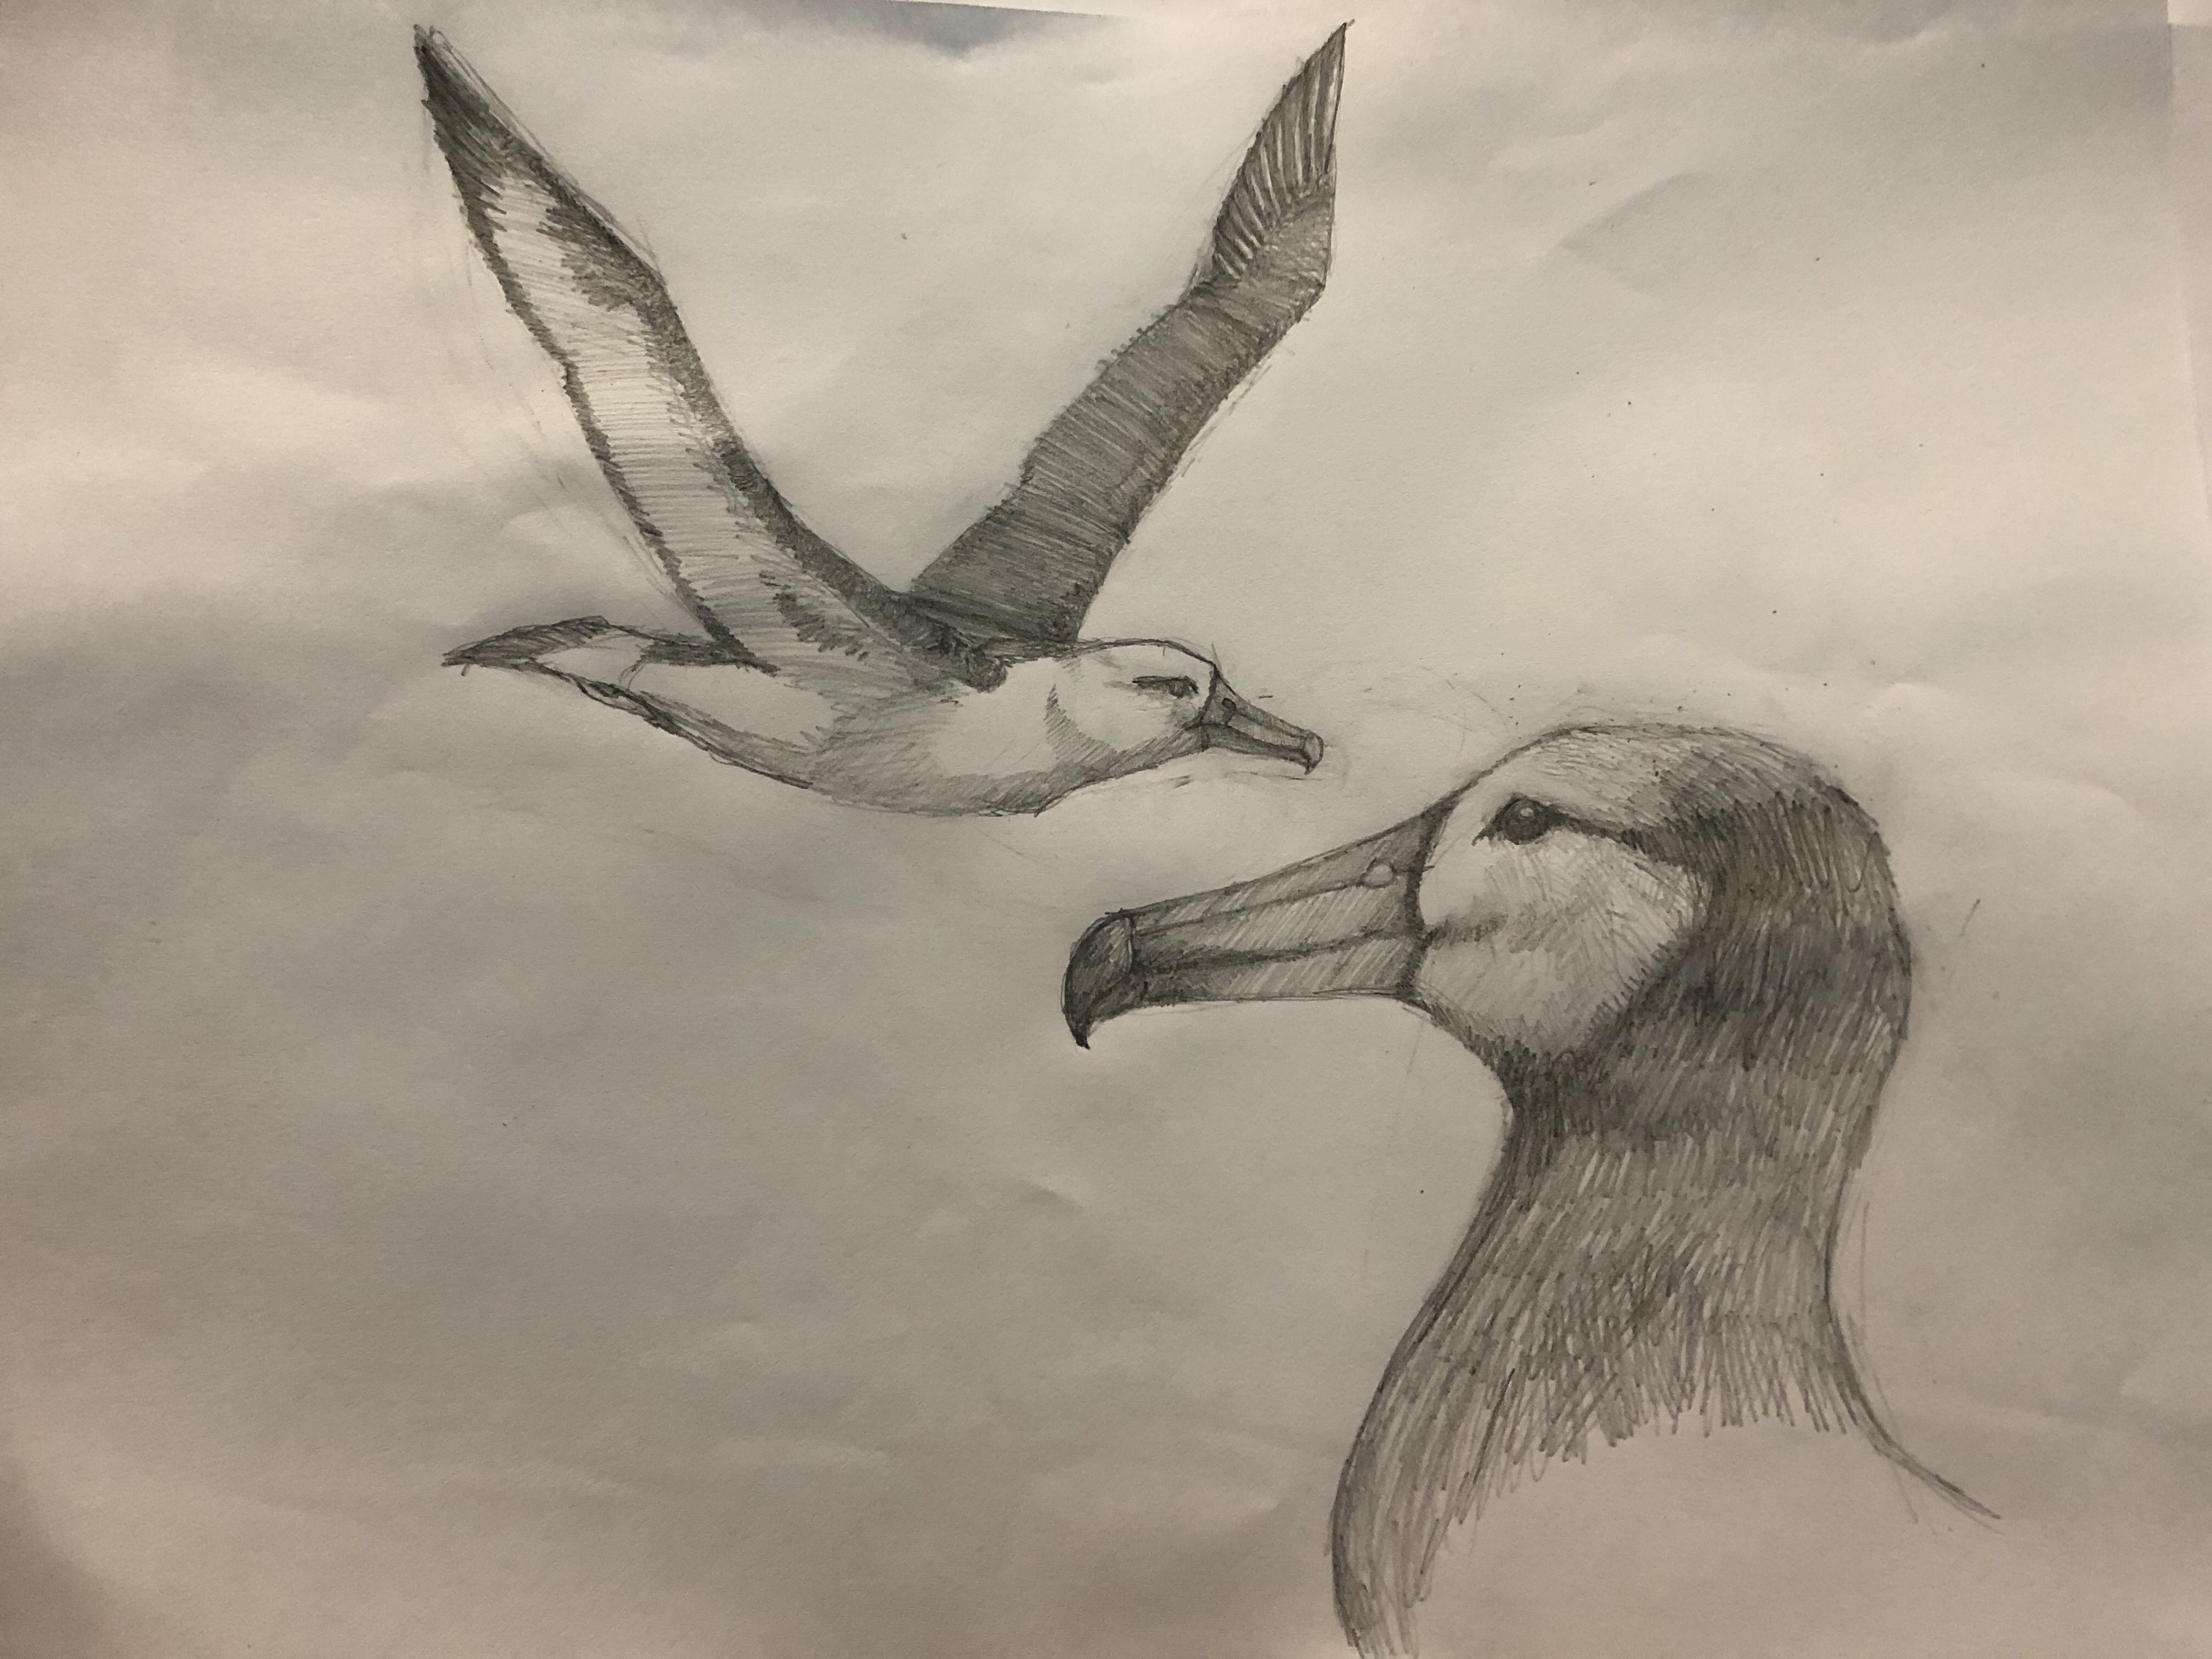 Nathan's sketch